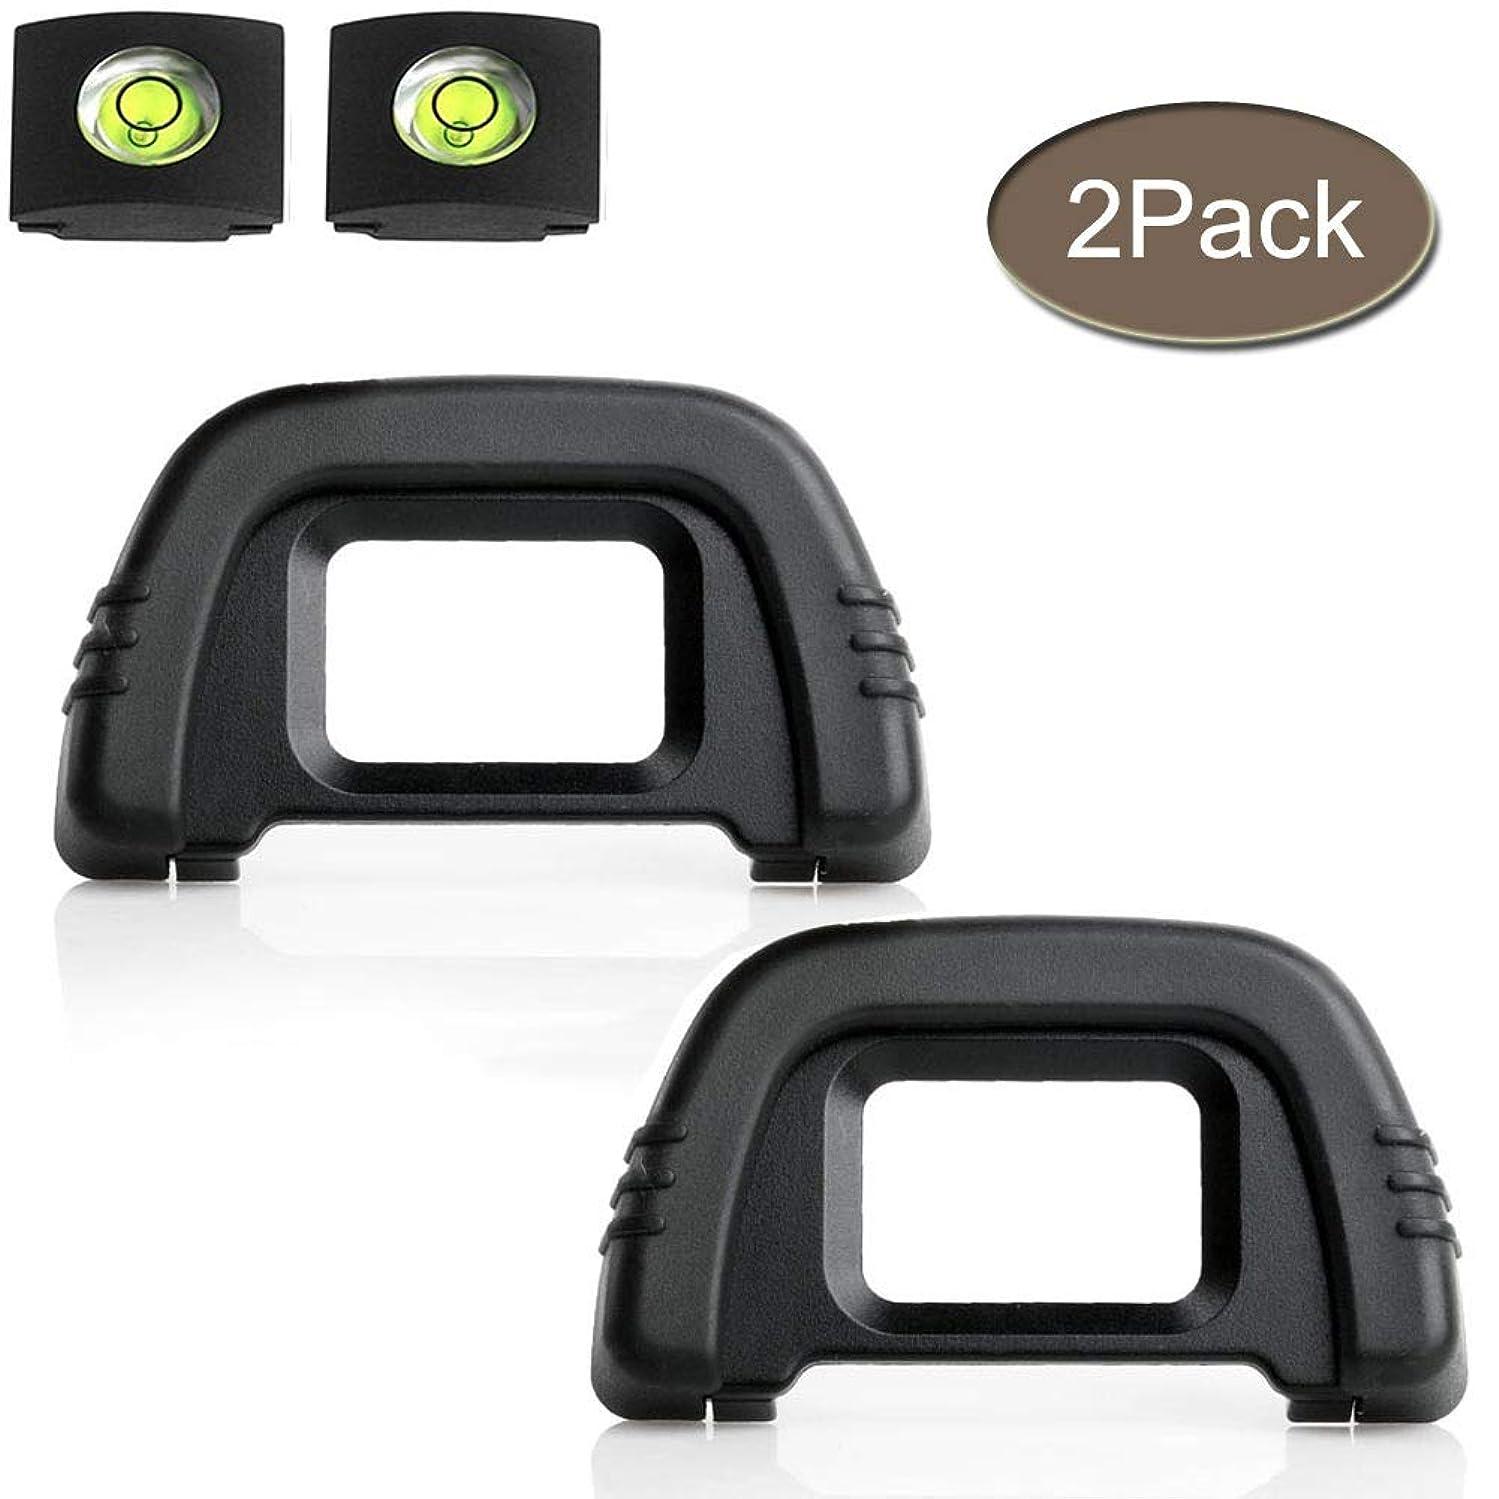 D90 D7000 Eyepiece Eyecup Viewfinder Eye Cup DK-21 Compatible for Nikon D750 D610 D600 D300 D200 D80 D70 D50 Camera, ULBTER Eyepiece Cover & Bubble Spirit Level Hot Shoe Cover -(2+2 Pack)